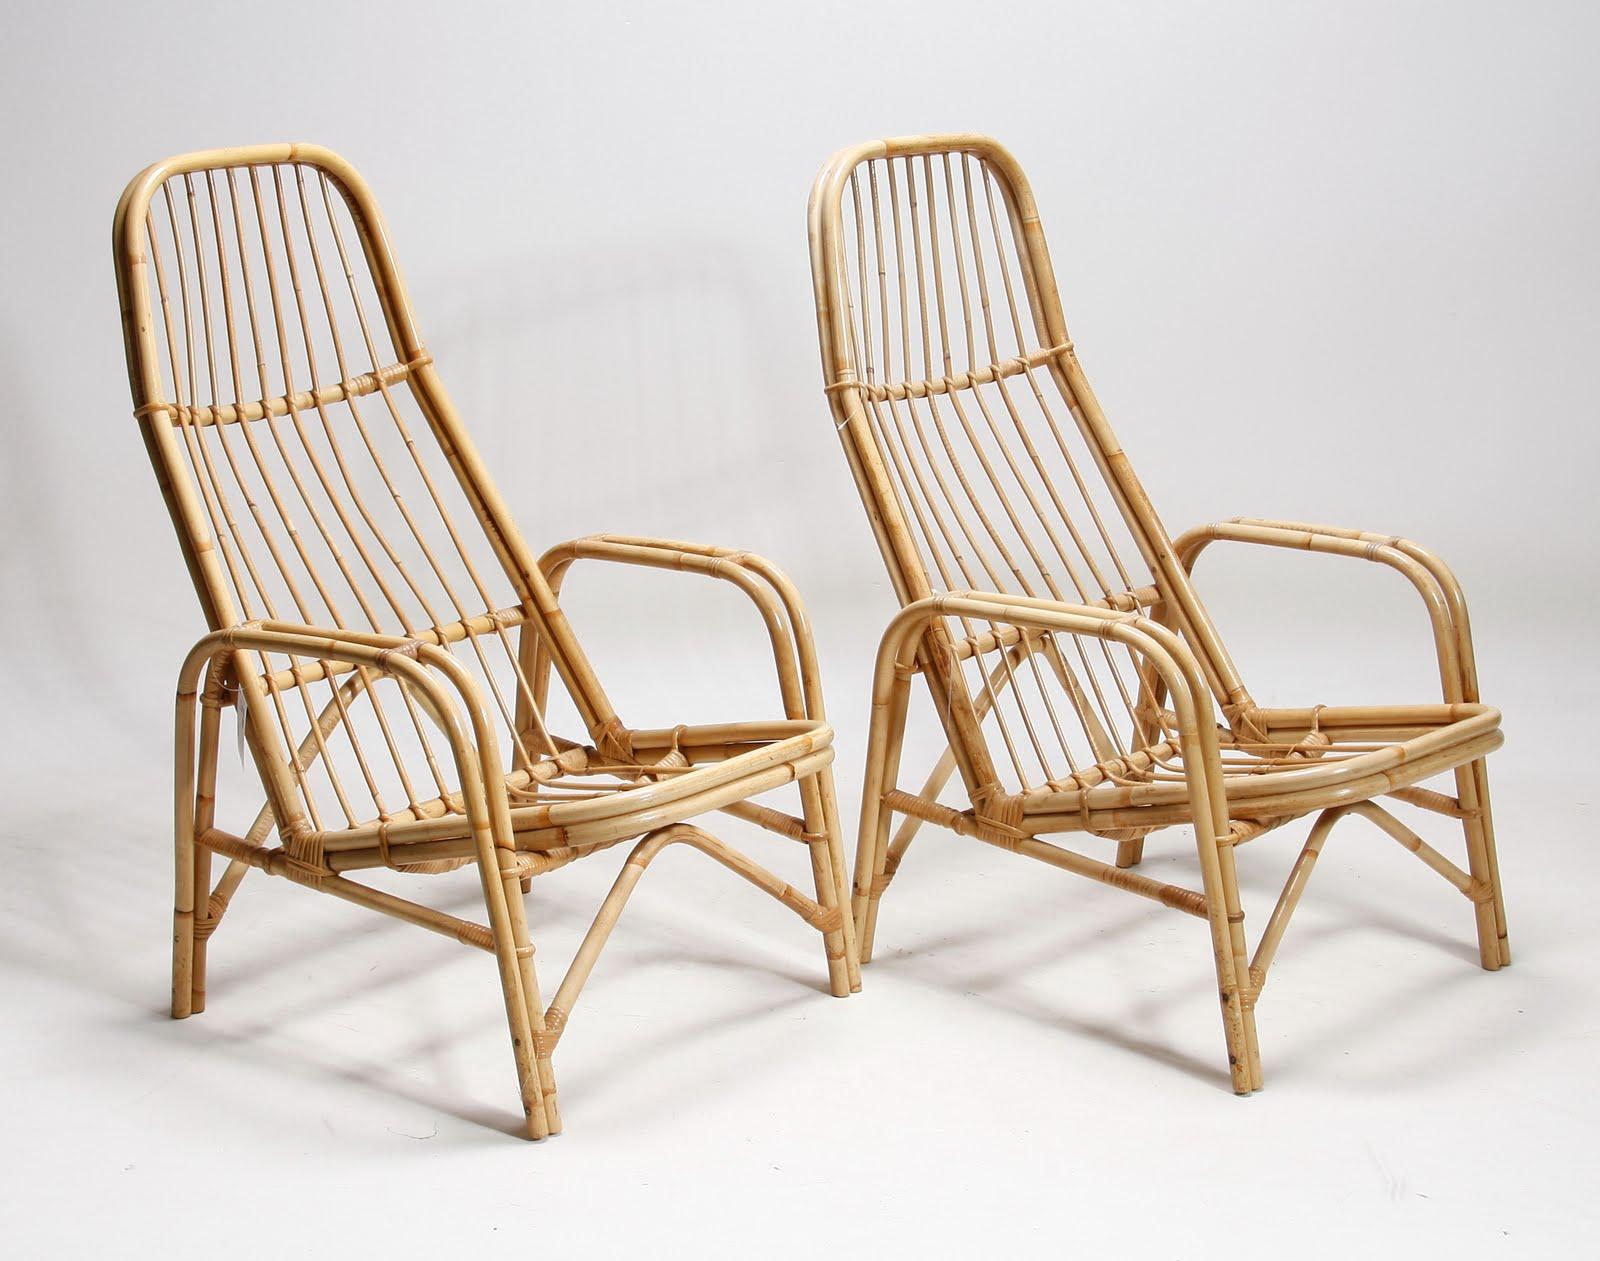 Home Grooming: Rattan furniture